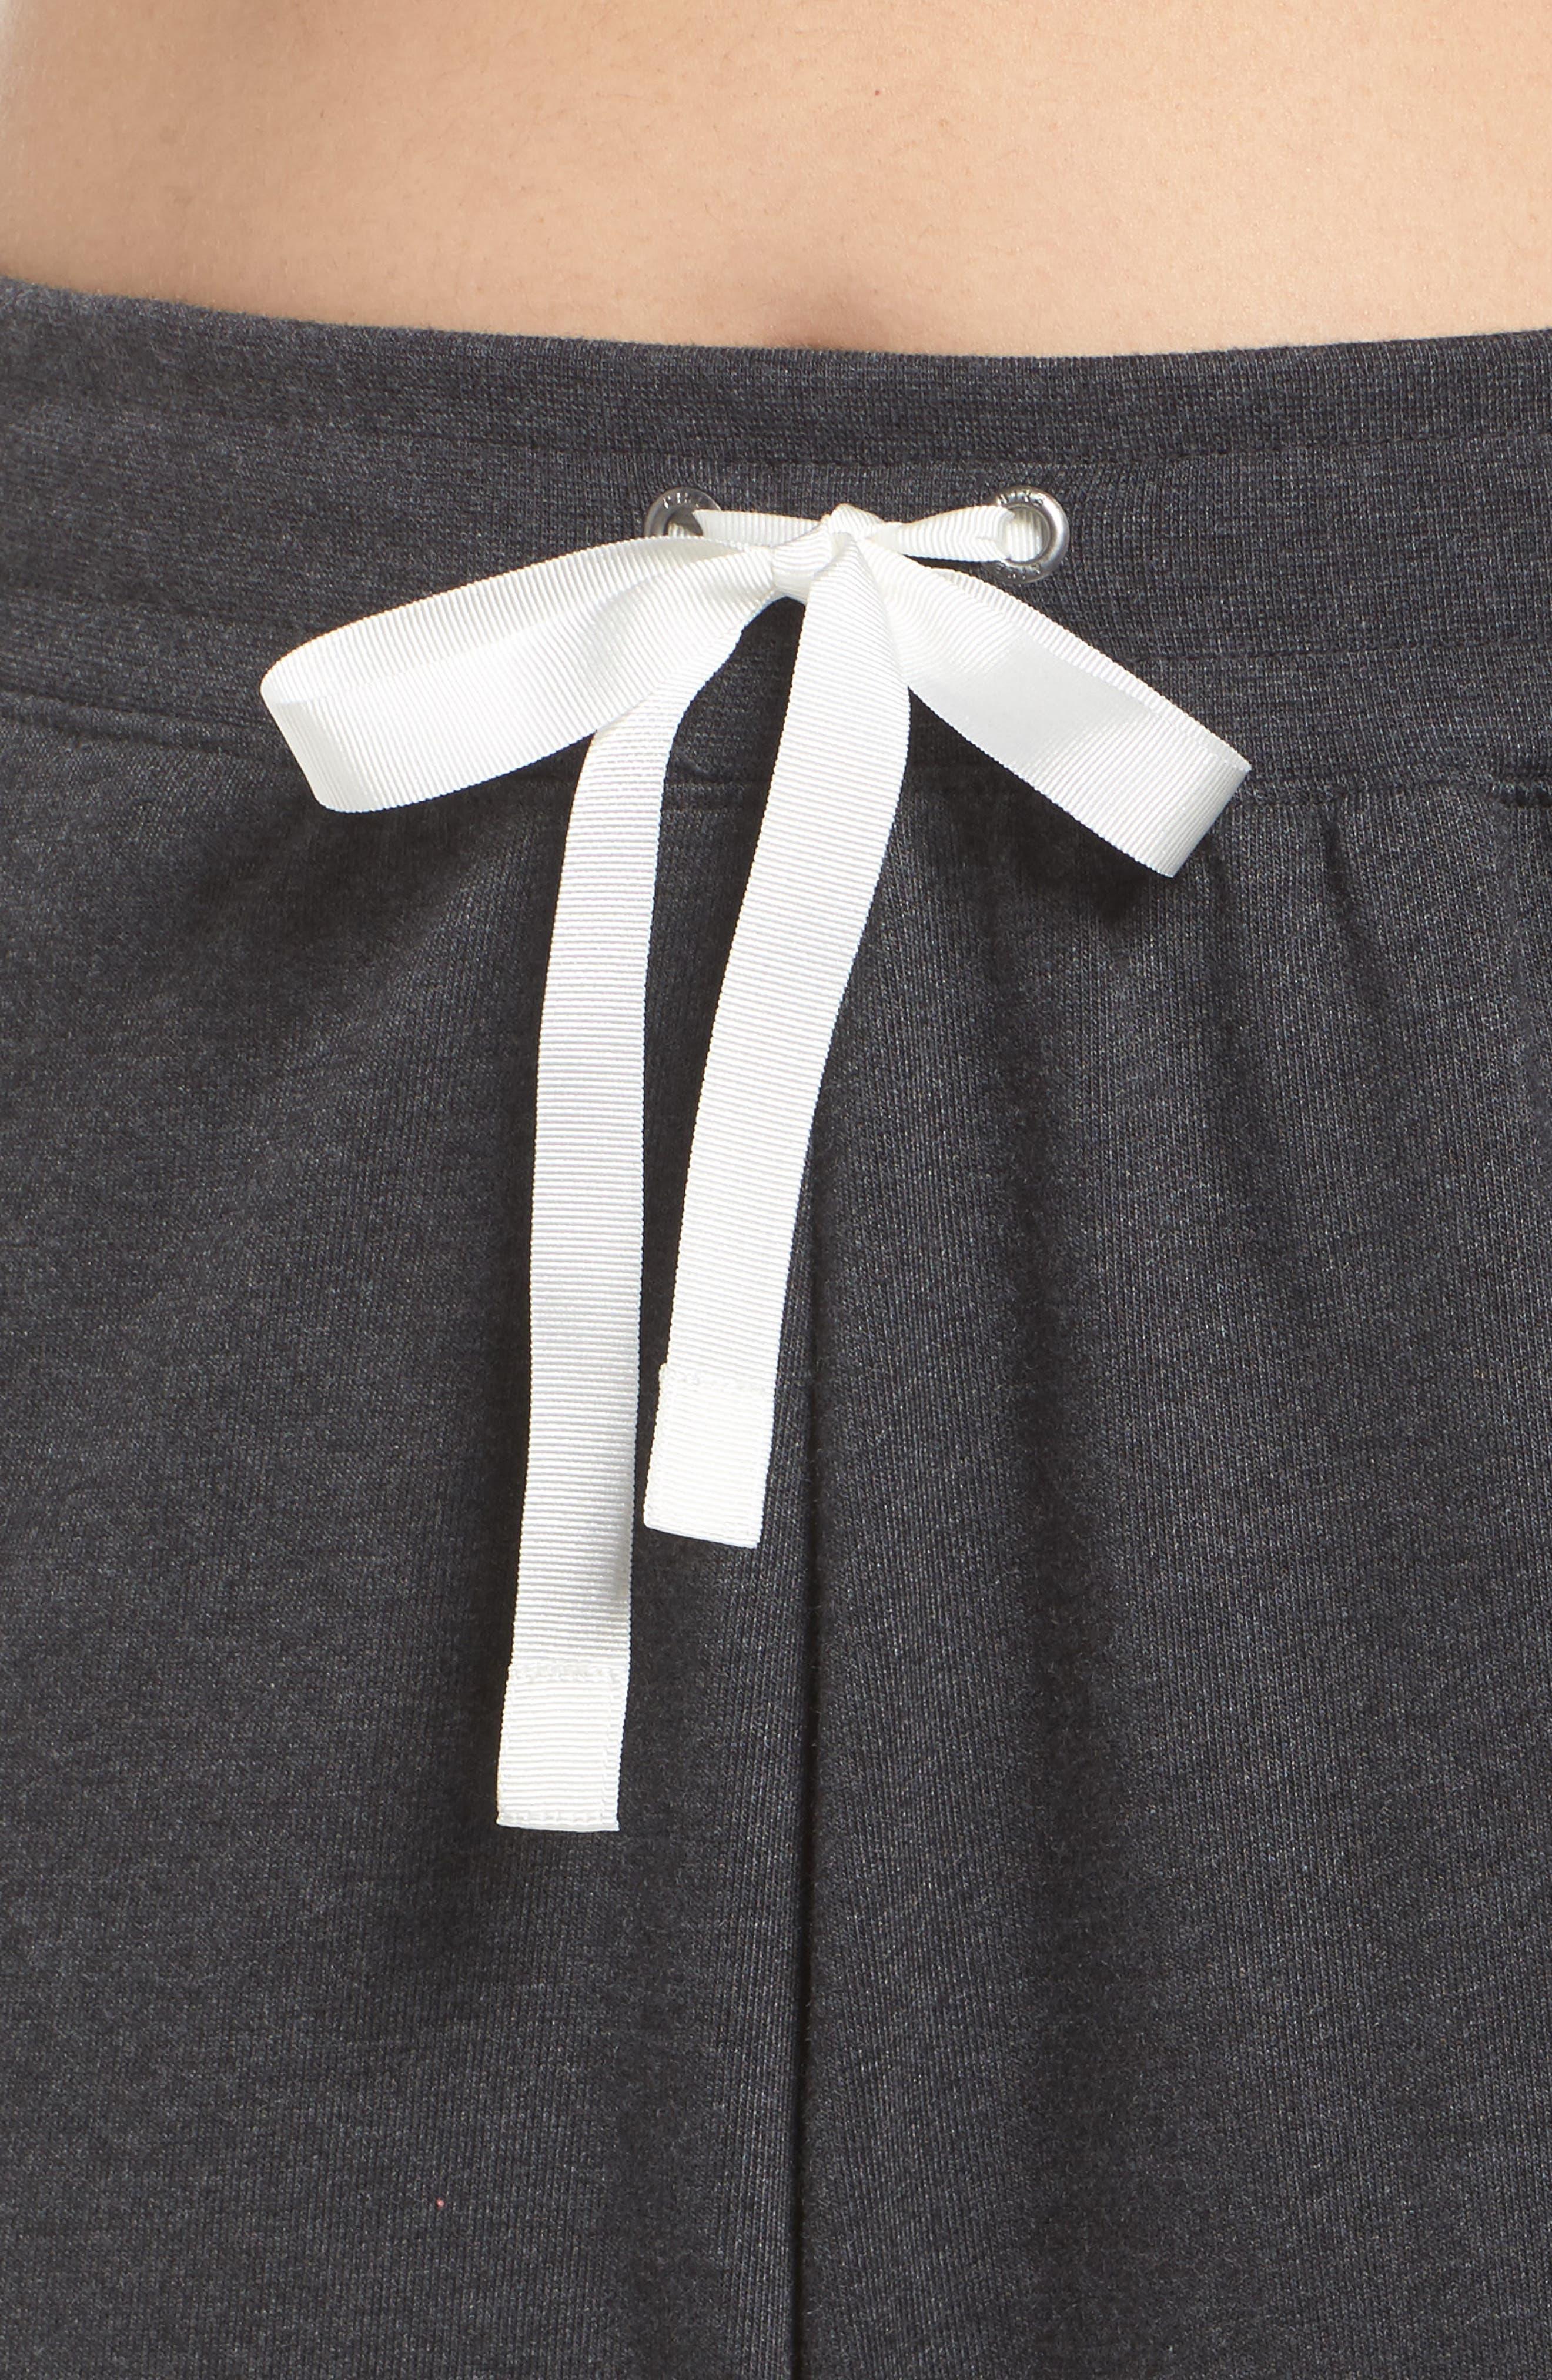 NIKE,                             Sportswear Gym Capris,                             Alternate thumbnail 4, color,                             001